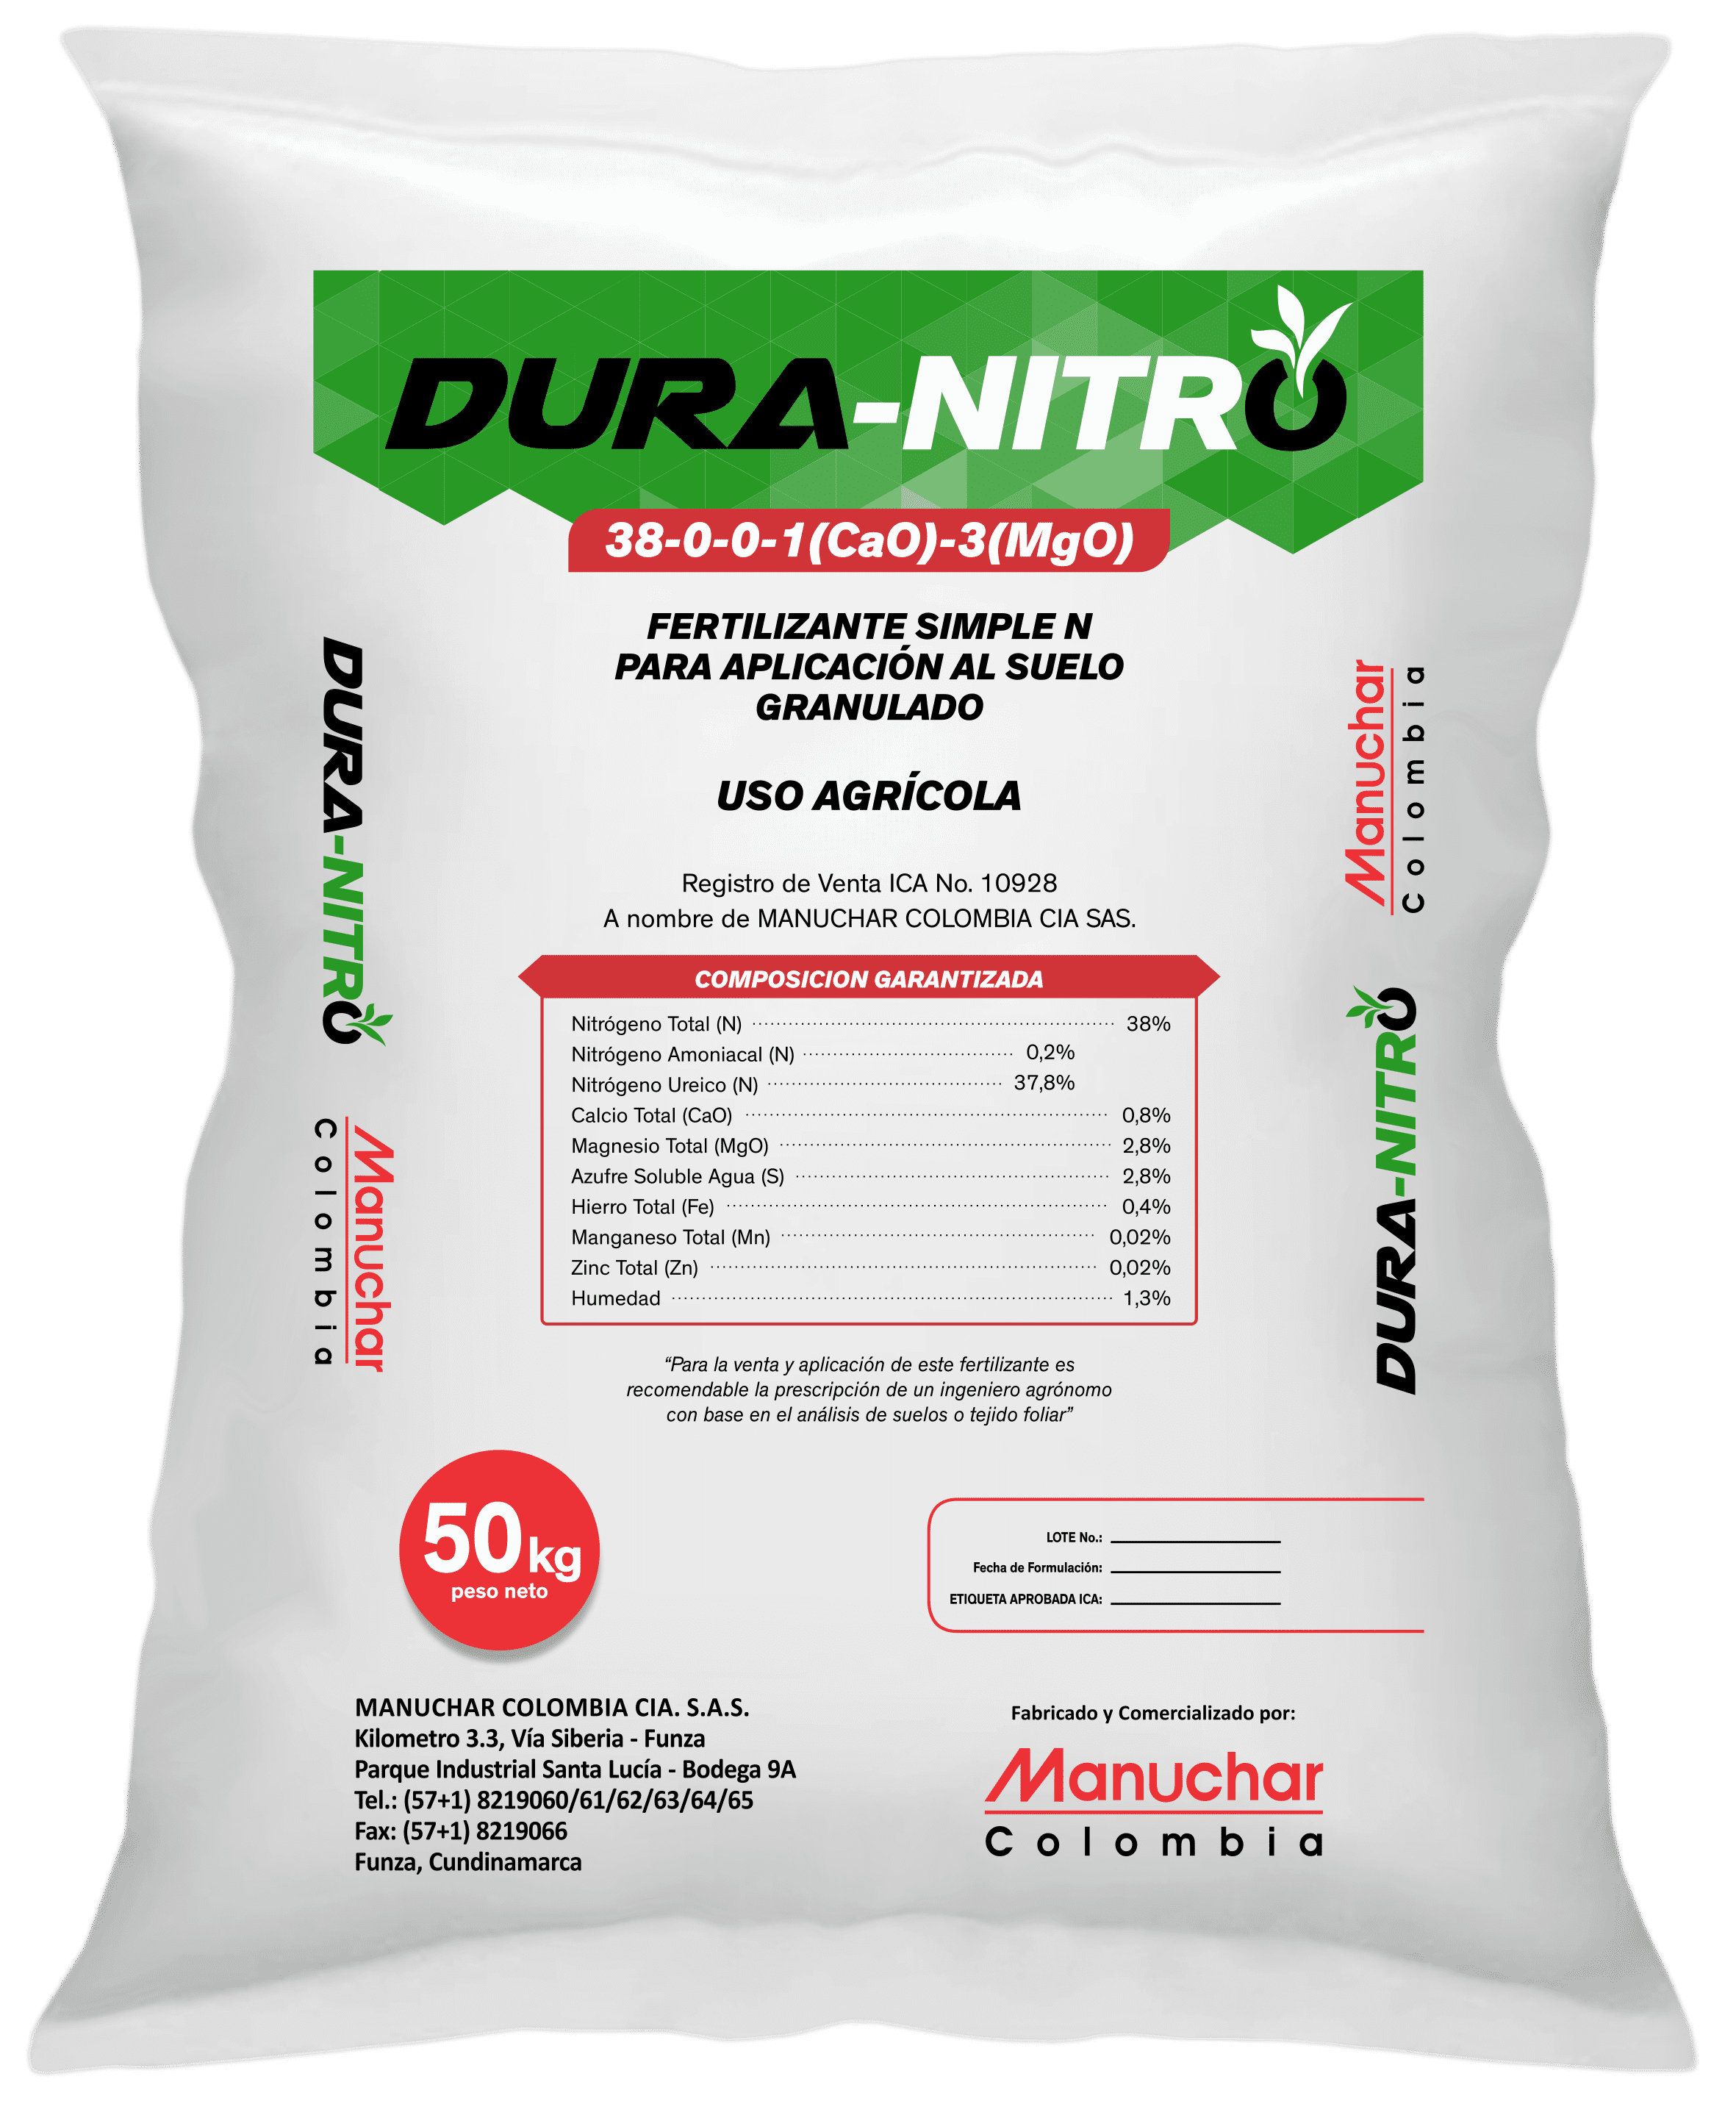 Fertilizante duranitro duramon manuchar 50 kg